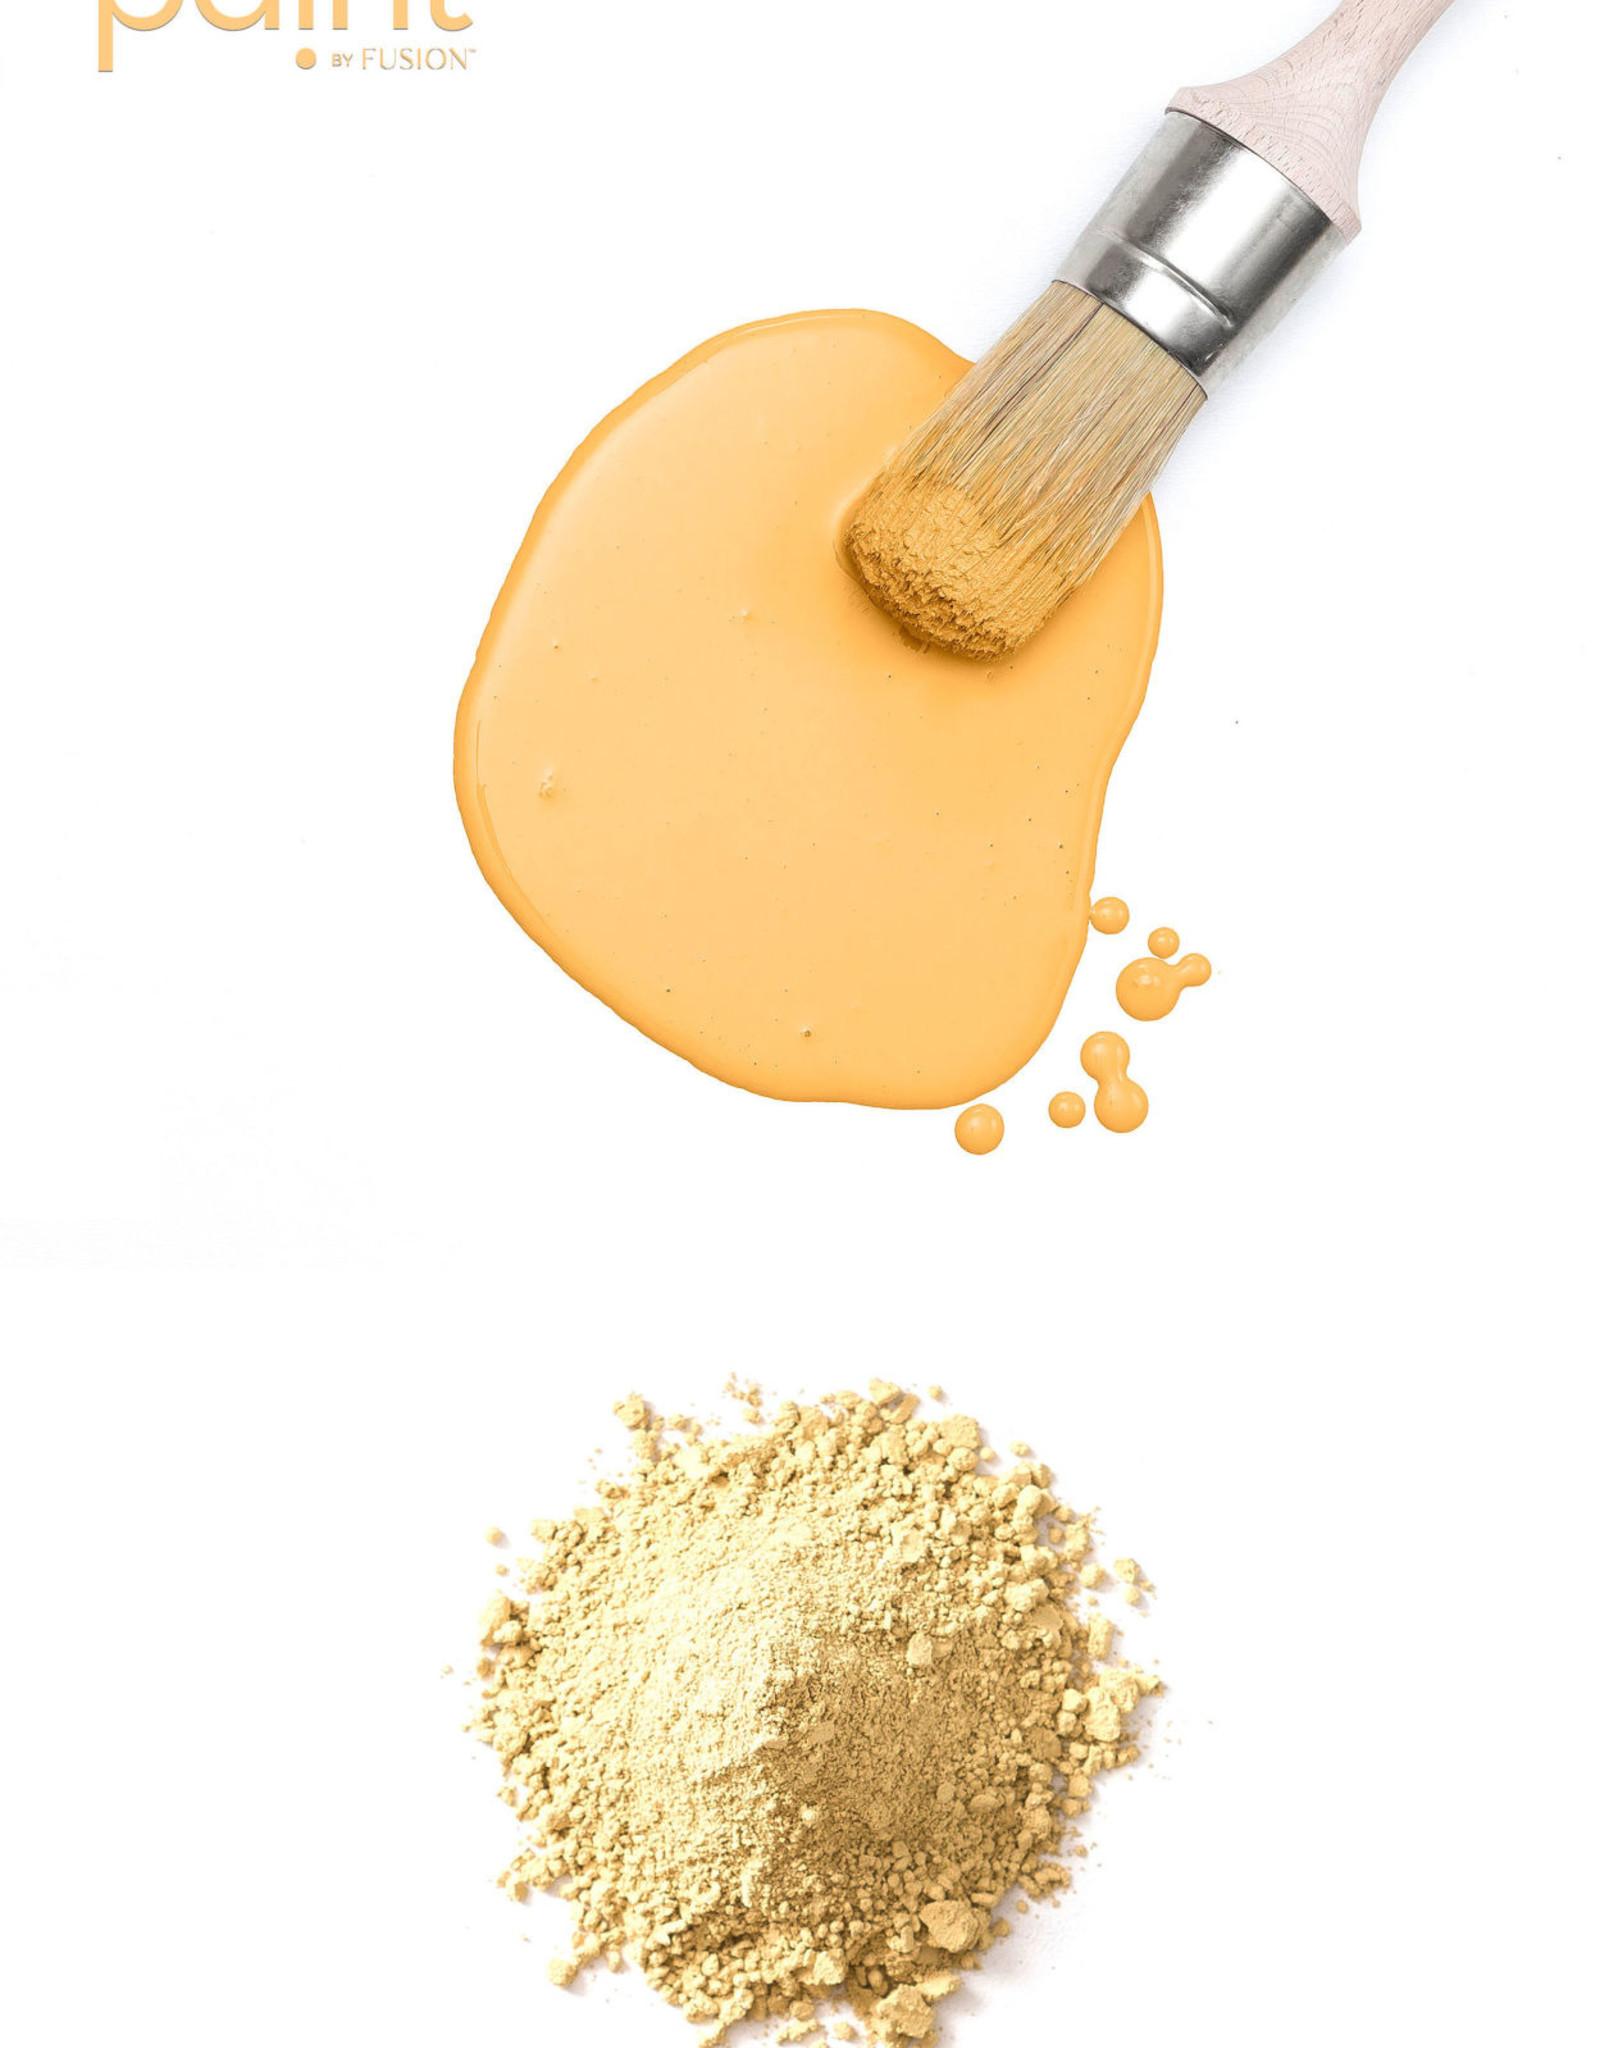 Fusion Mineral Paint Milk Paint 330g Mod Mustard